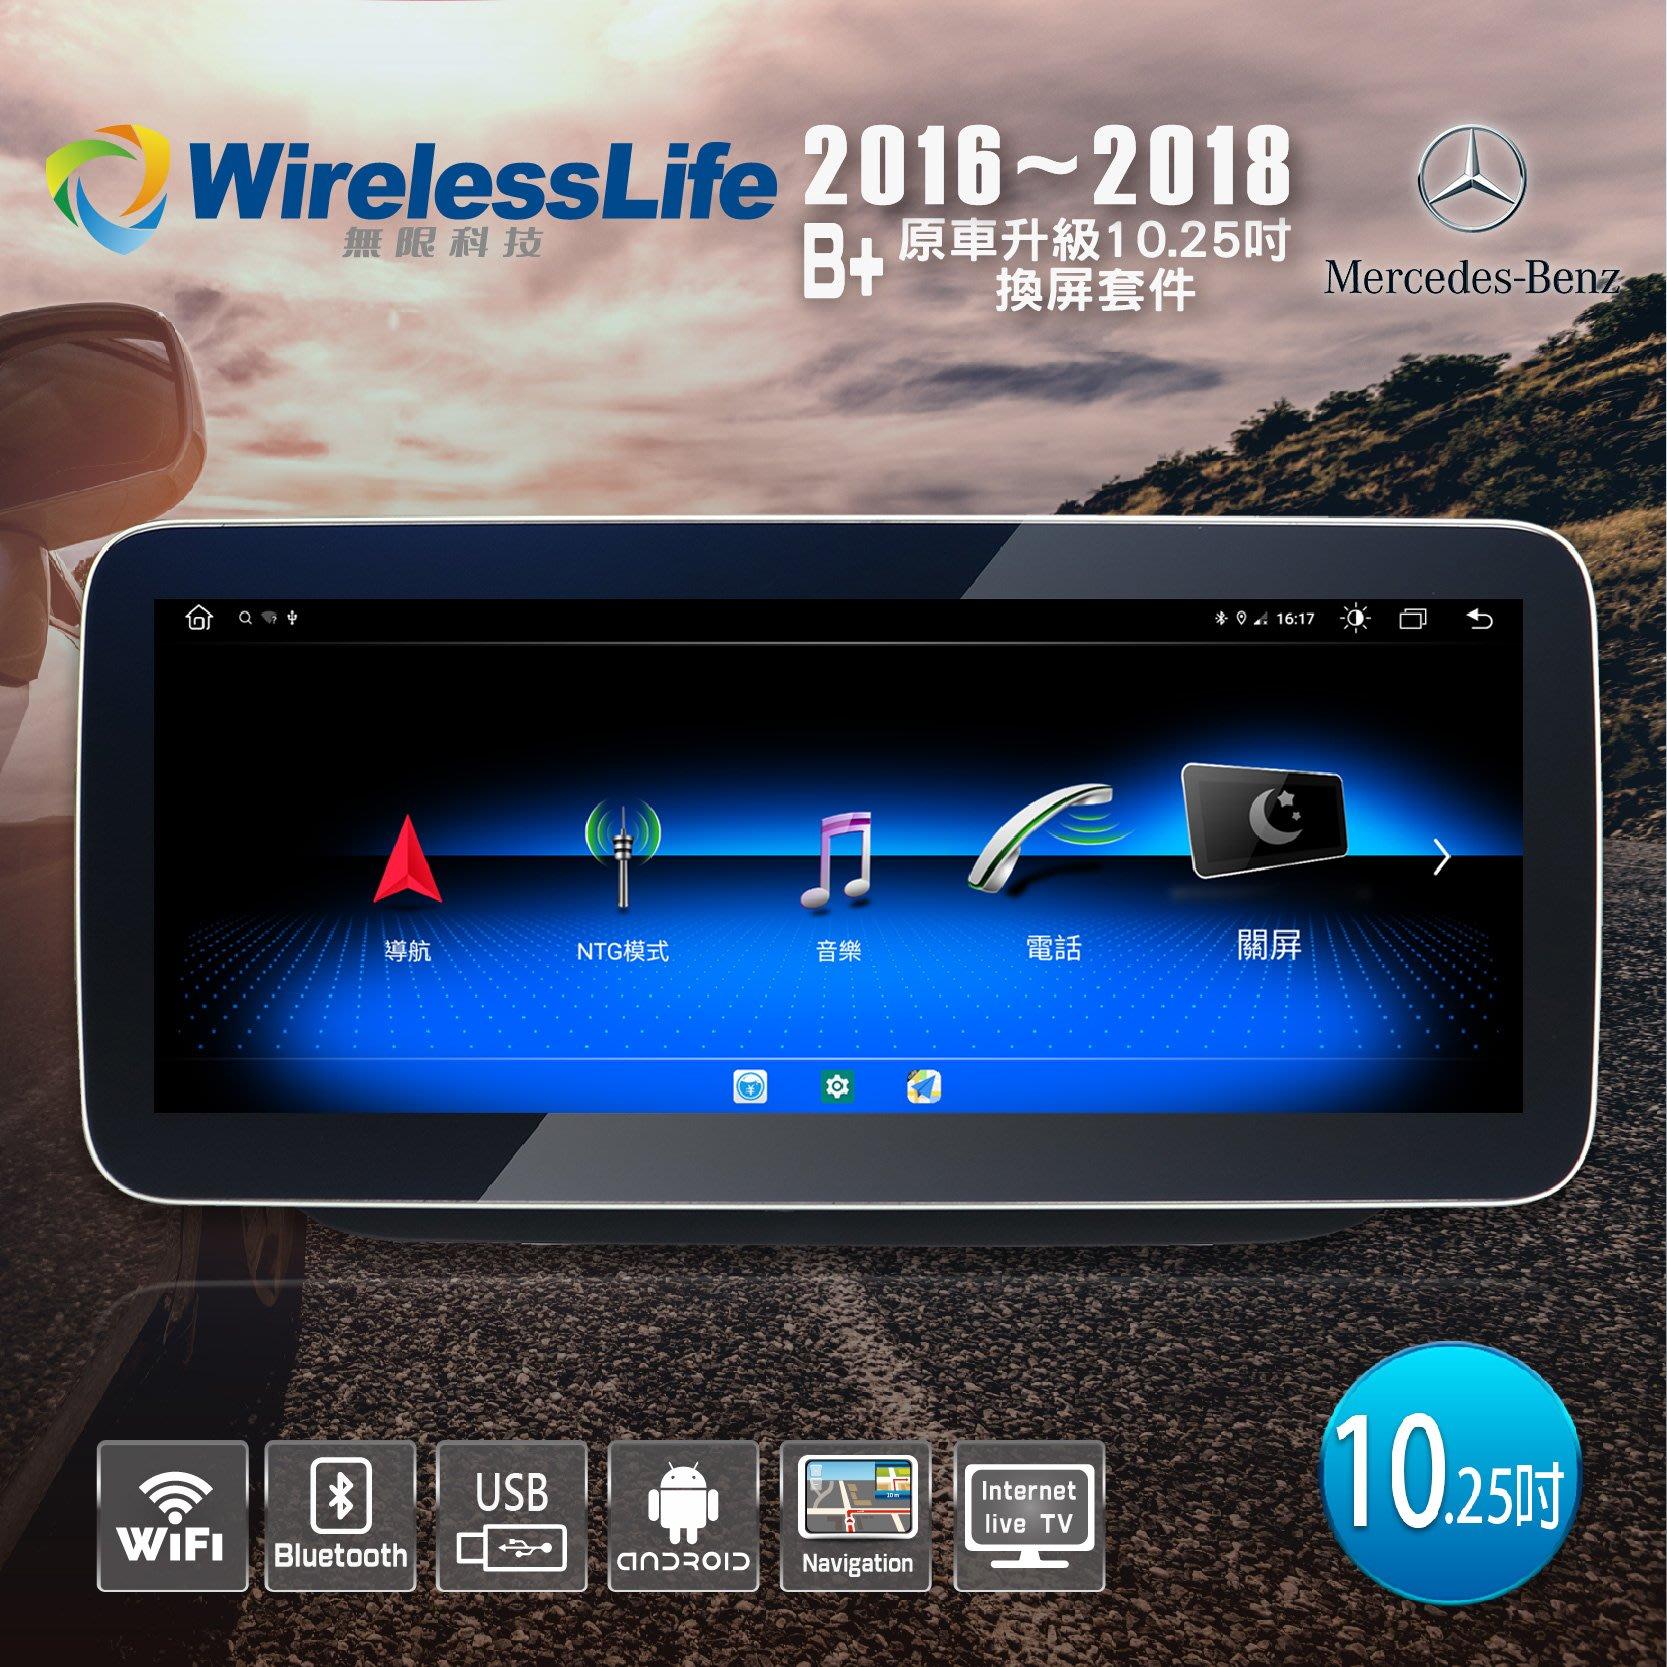 【BENZ賓士】16~18 B+專用機 10.25吋 頂級原車屏升級 六核心 安卓10系統 無限科技